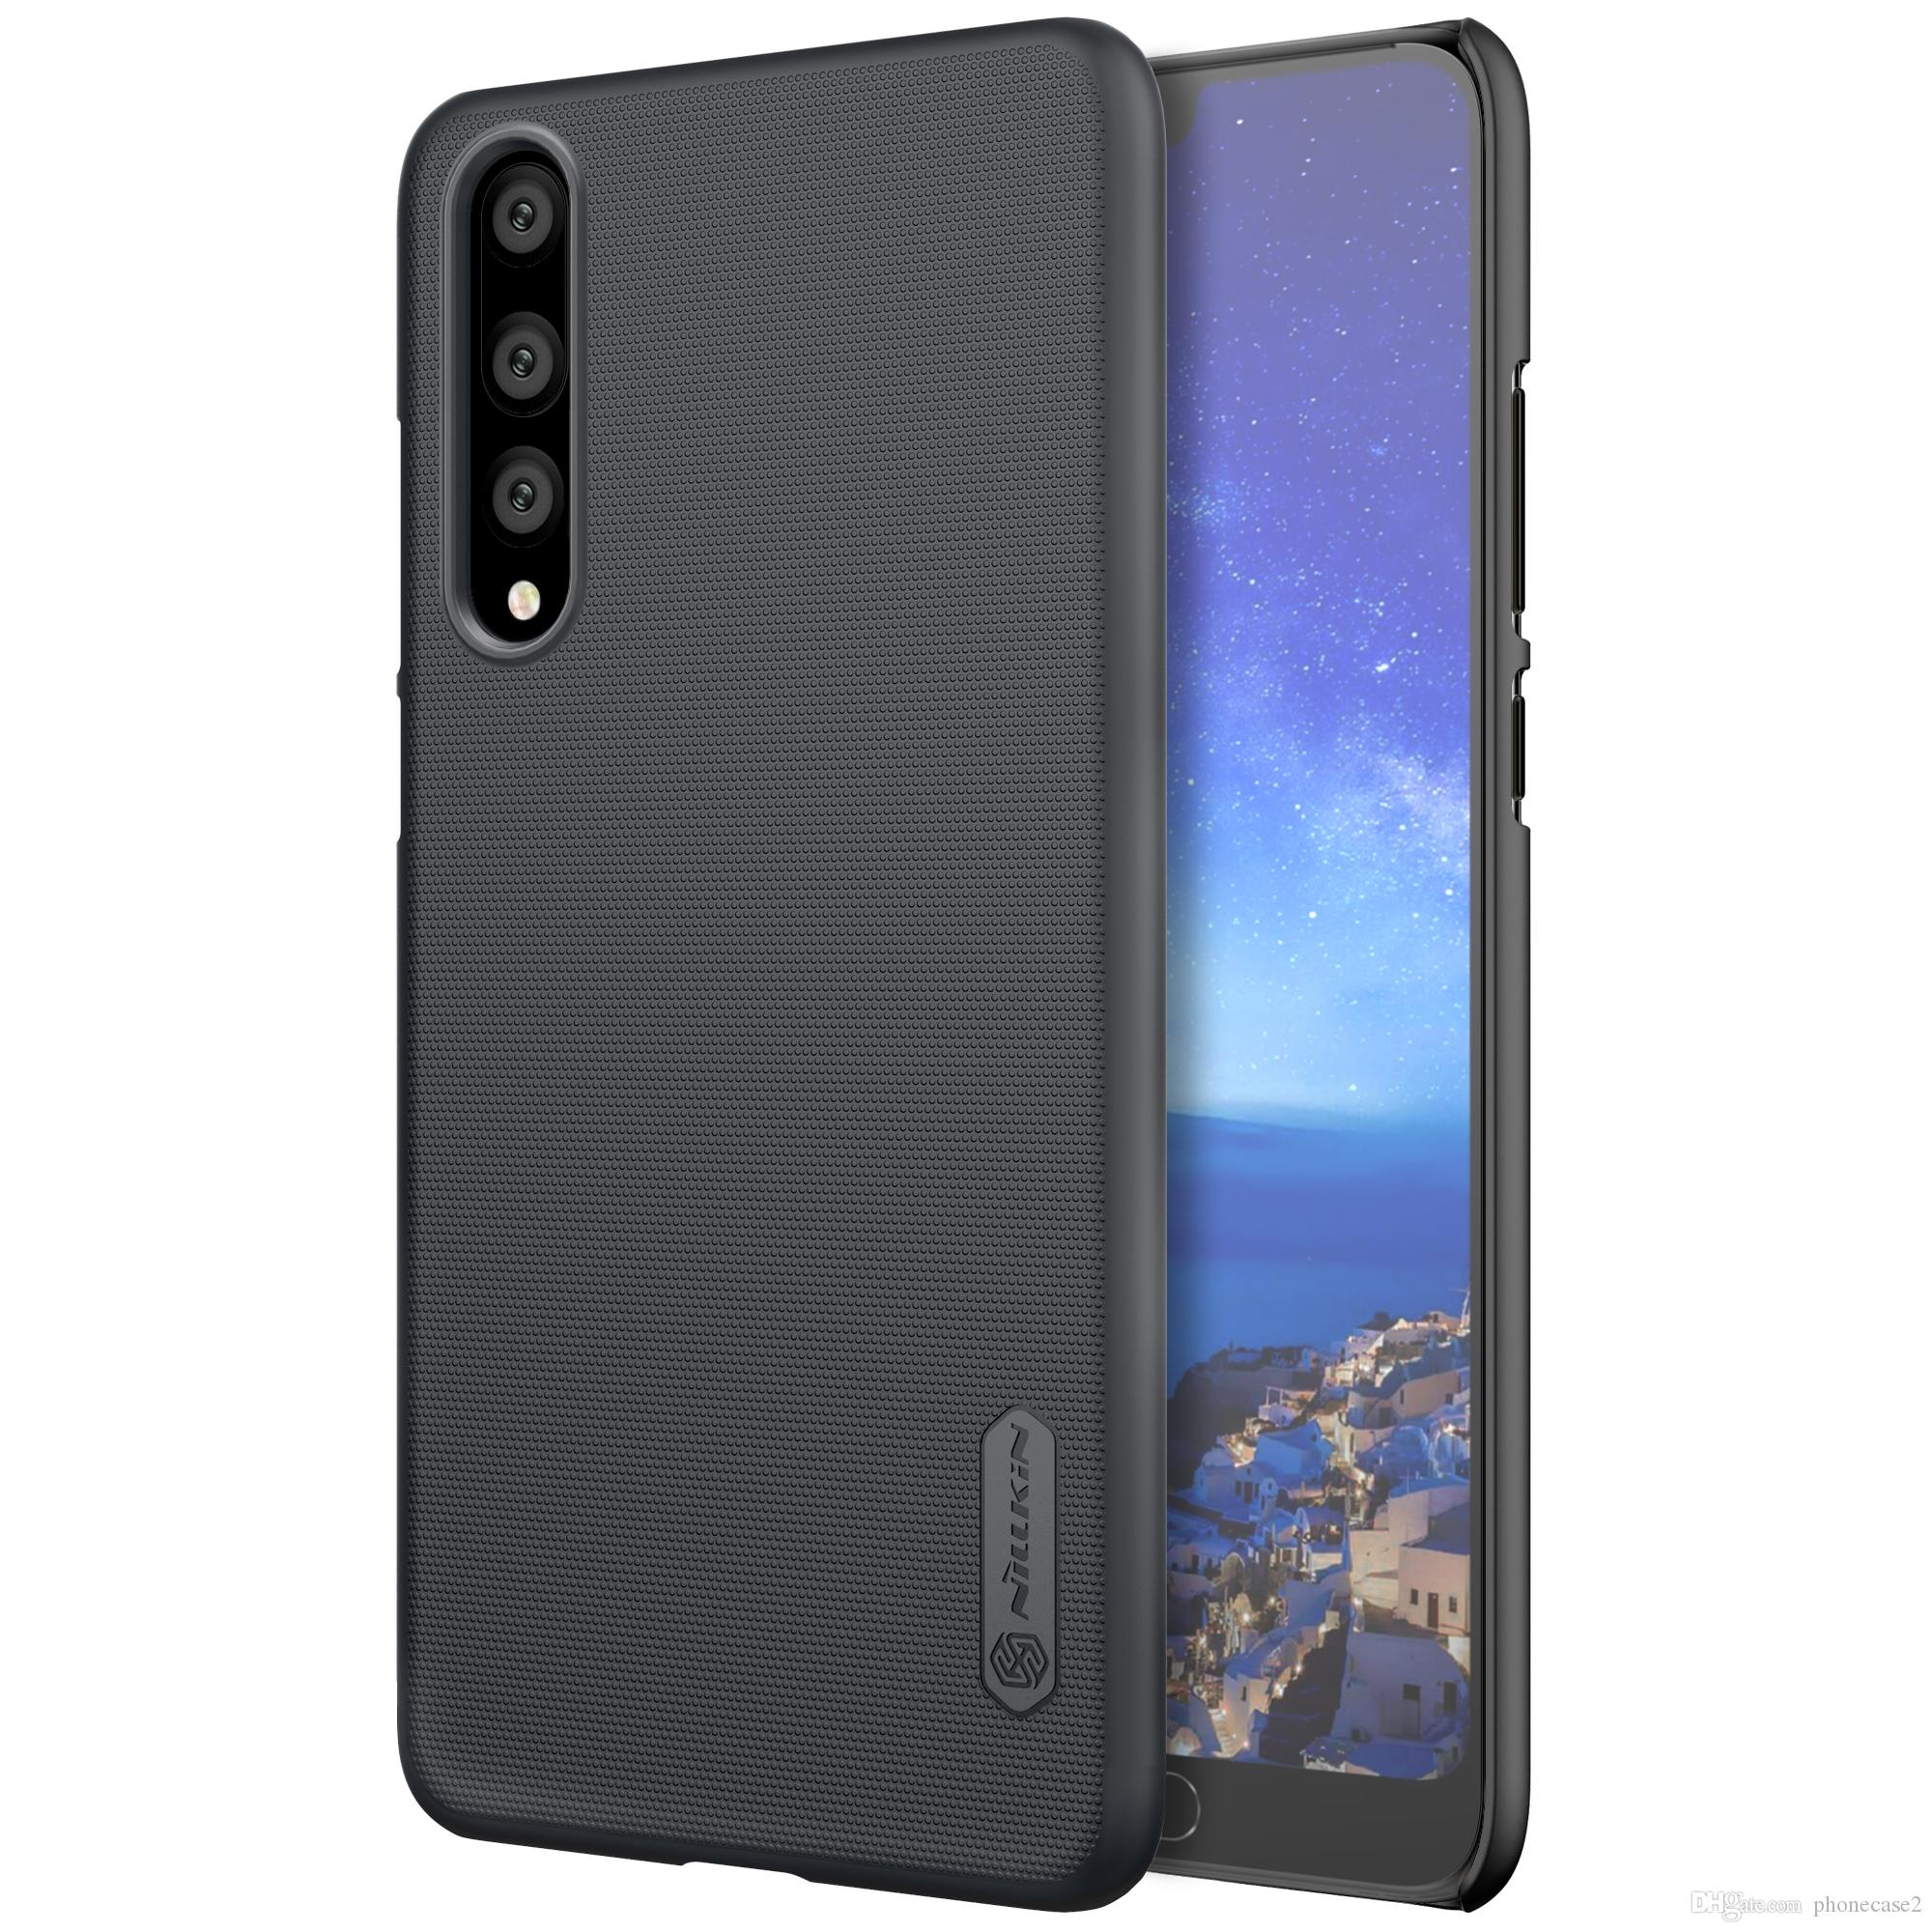 Handy Günstig Kaufen Huawei P20 Pro Fall Nillkin Frosted Shield Pc Kunststoff Hart Zurück Fall Für Huawei P20 Pro Geschenk Screen Protector Günstig Handy